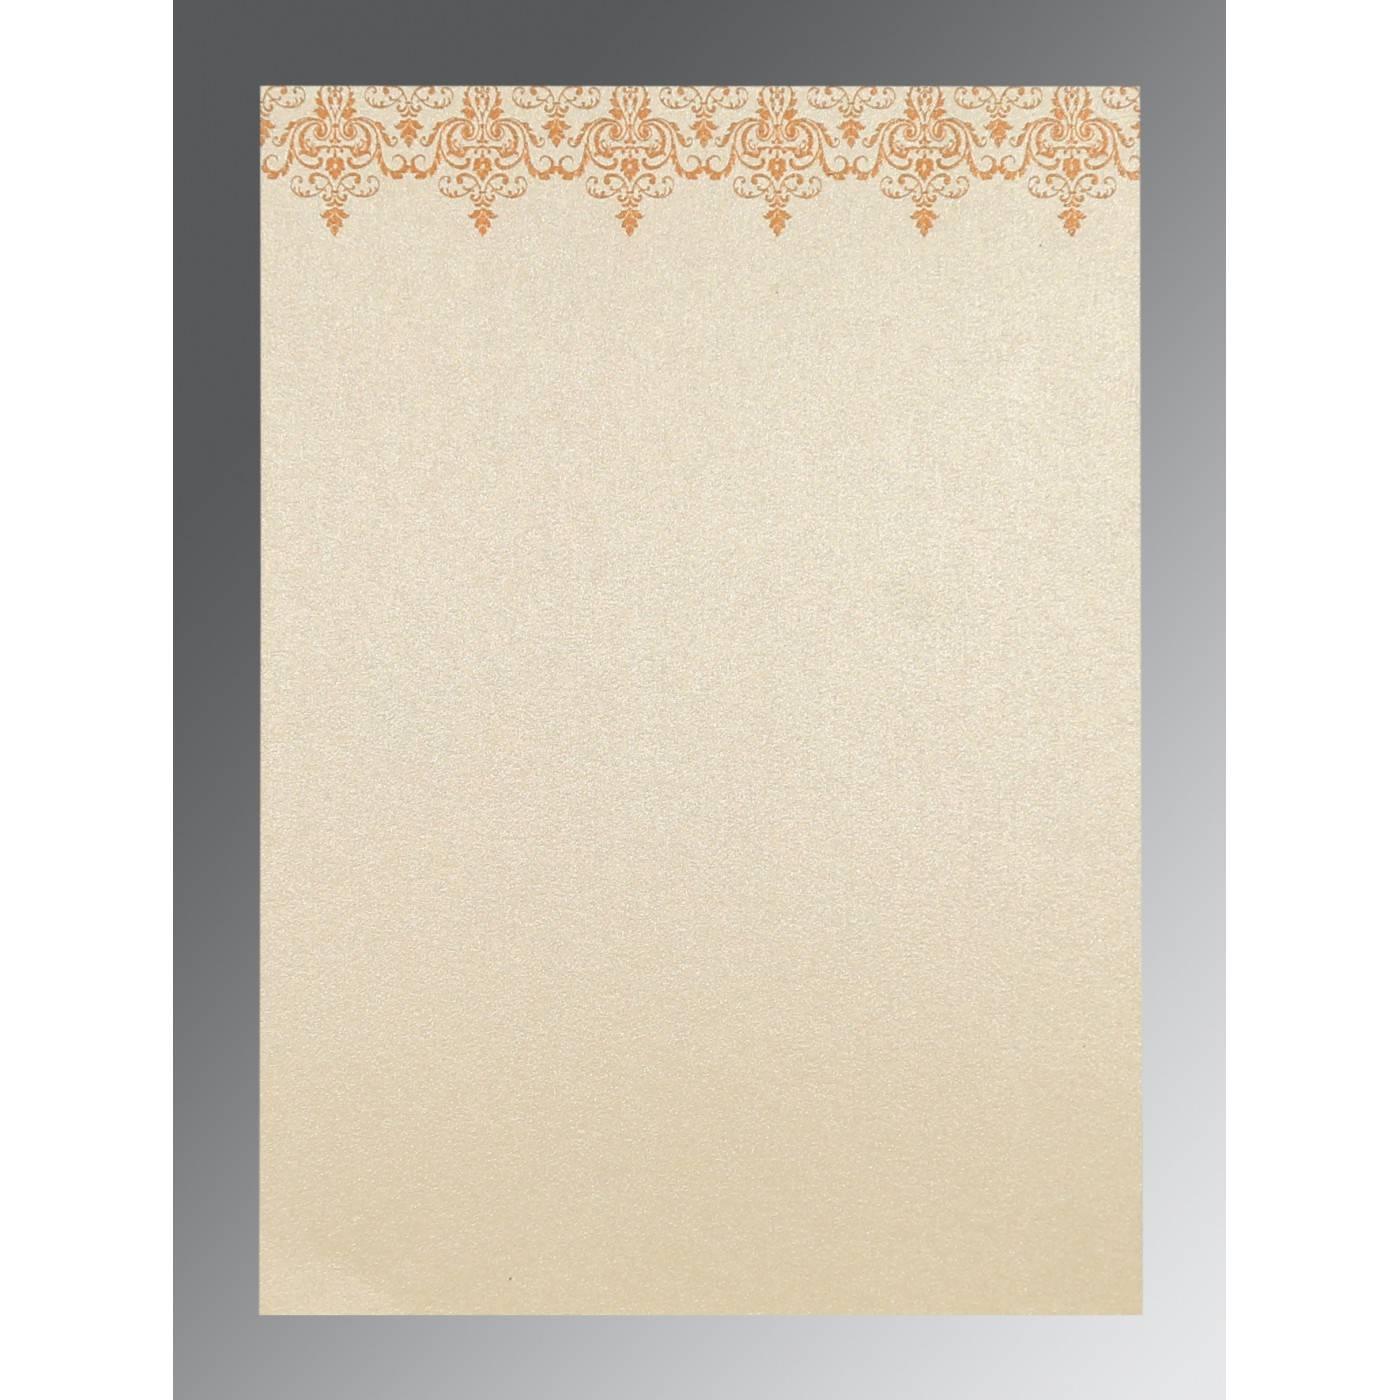 SATIN GOLD SHIMMERY SCREEN PRINTED WEDDING CARD : CI-8244G - IndianWeddingCards